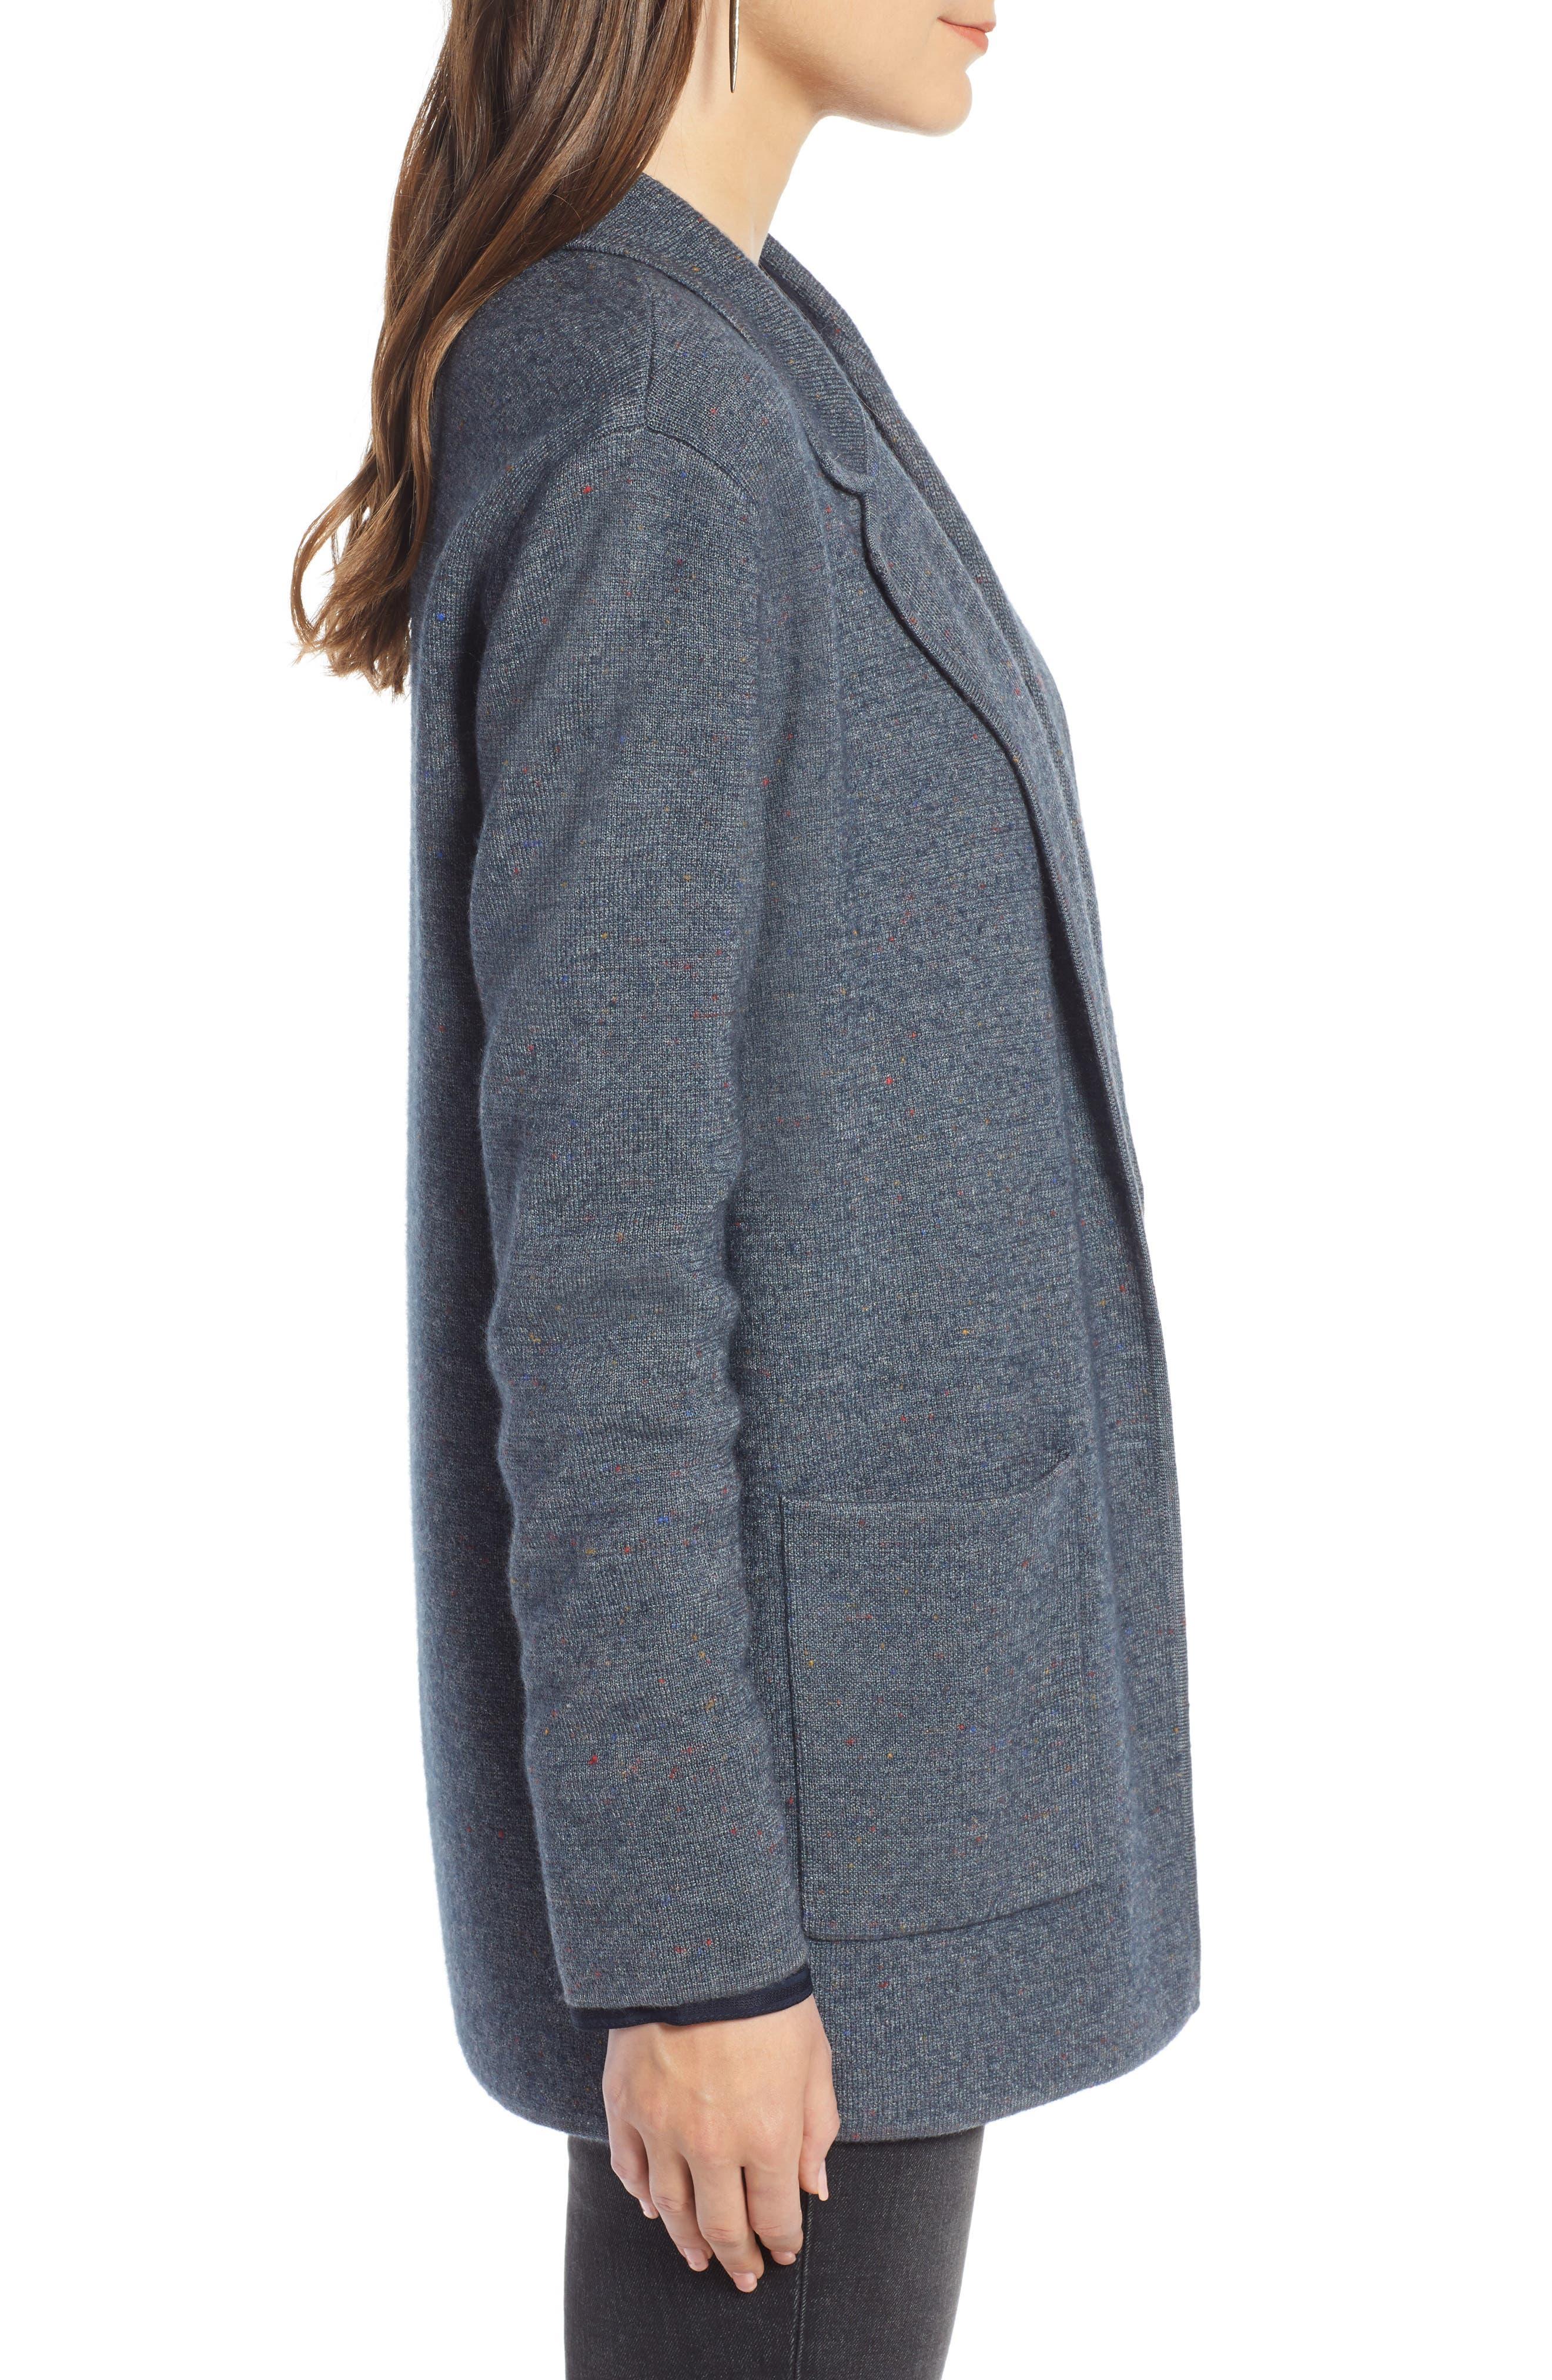 Sweater Blazer,                             Alternate thumbnail 3, color,                             GREY MEDIUM CHARCOAL HEATHER